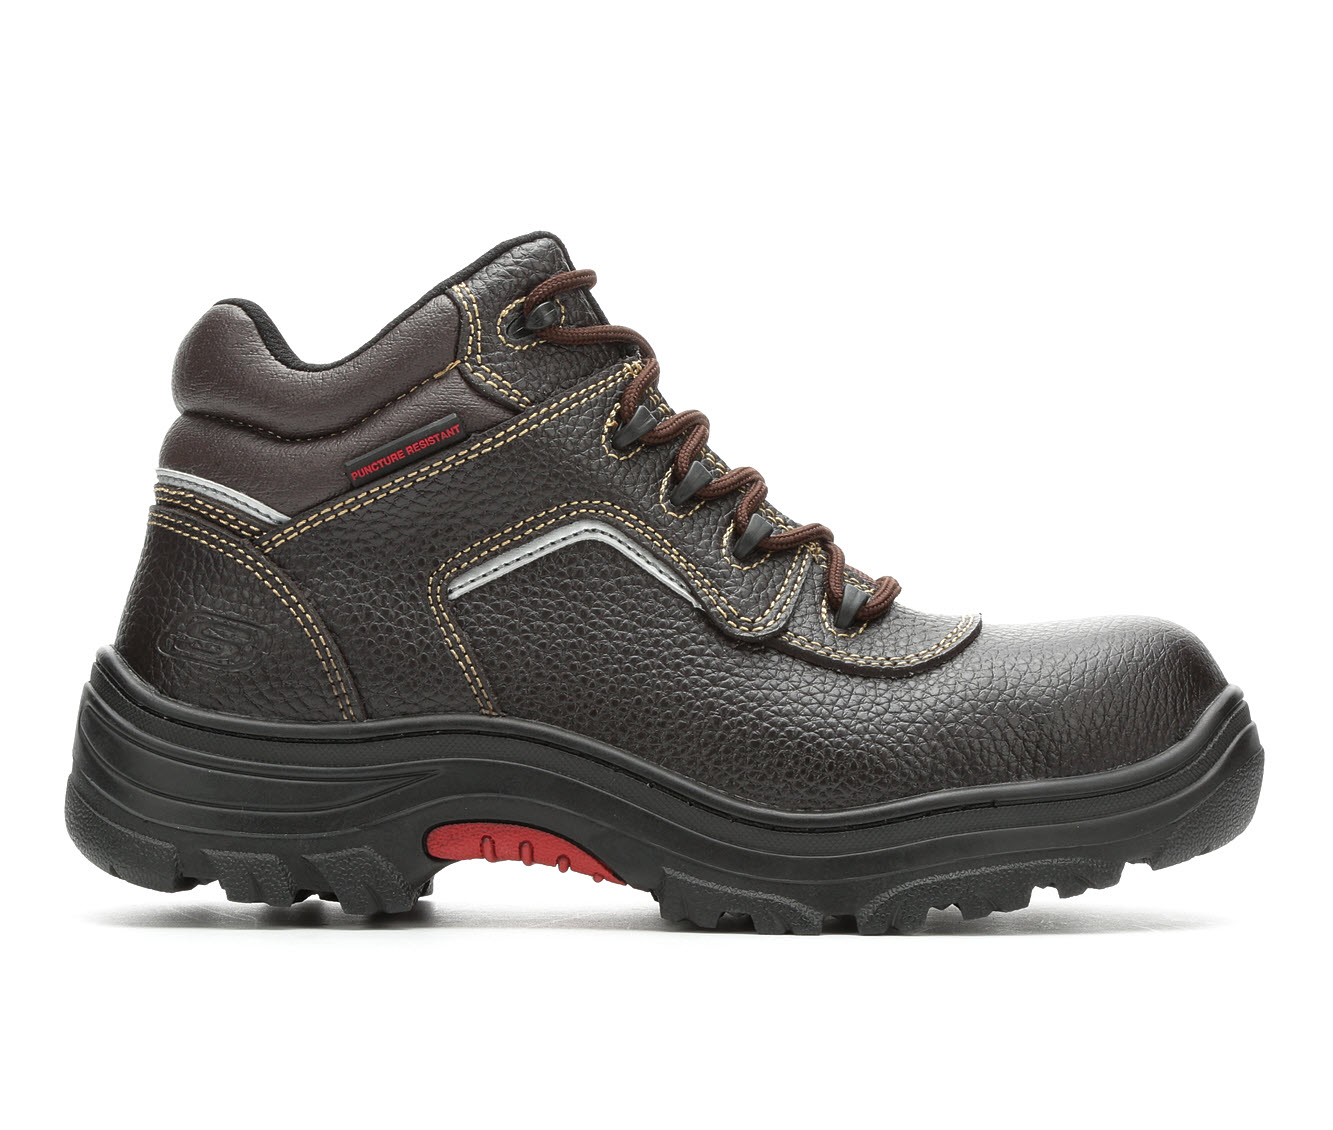 Skechers Work Workshire Burgin Sosder 77144 Men's Boots (Brown Faux Leather)